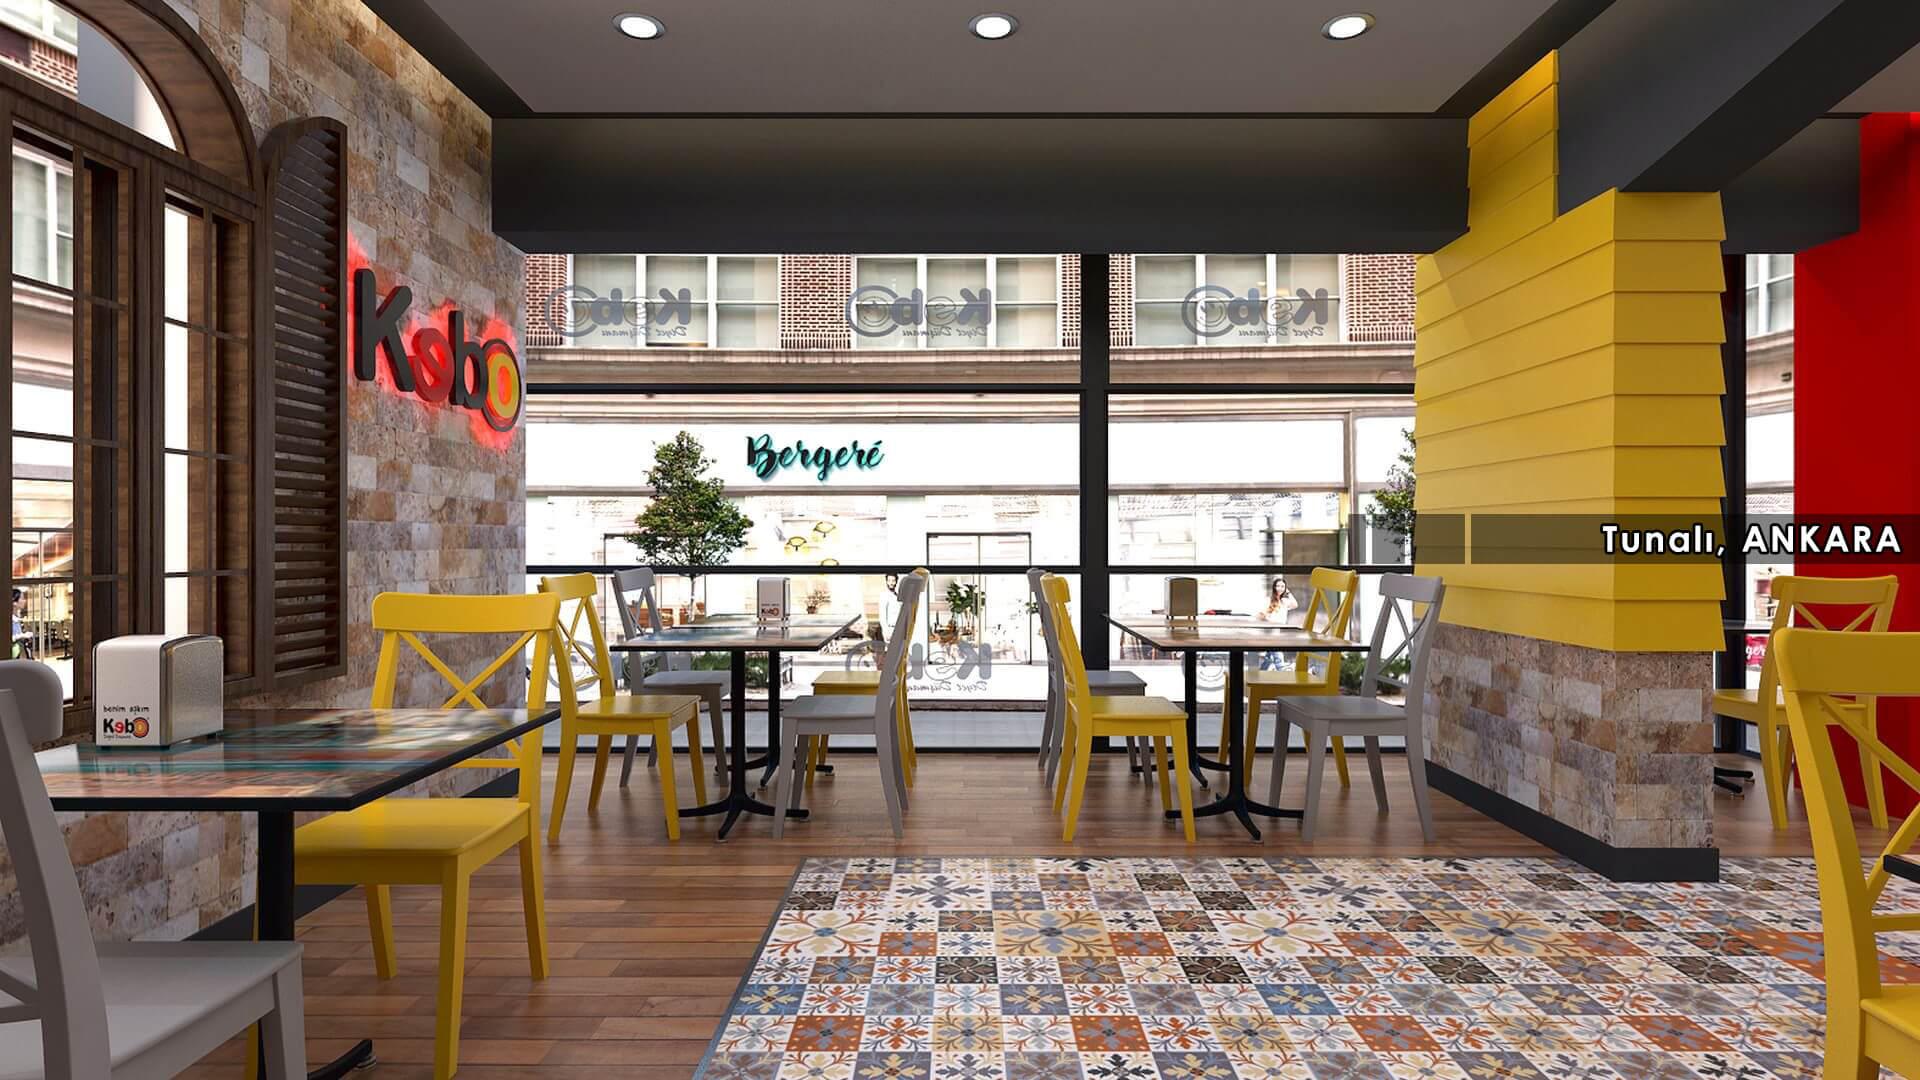 Restoran, Cafe, Fast-food Mimari Projeler Kebo 2016